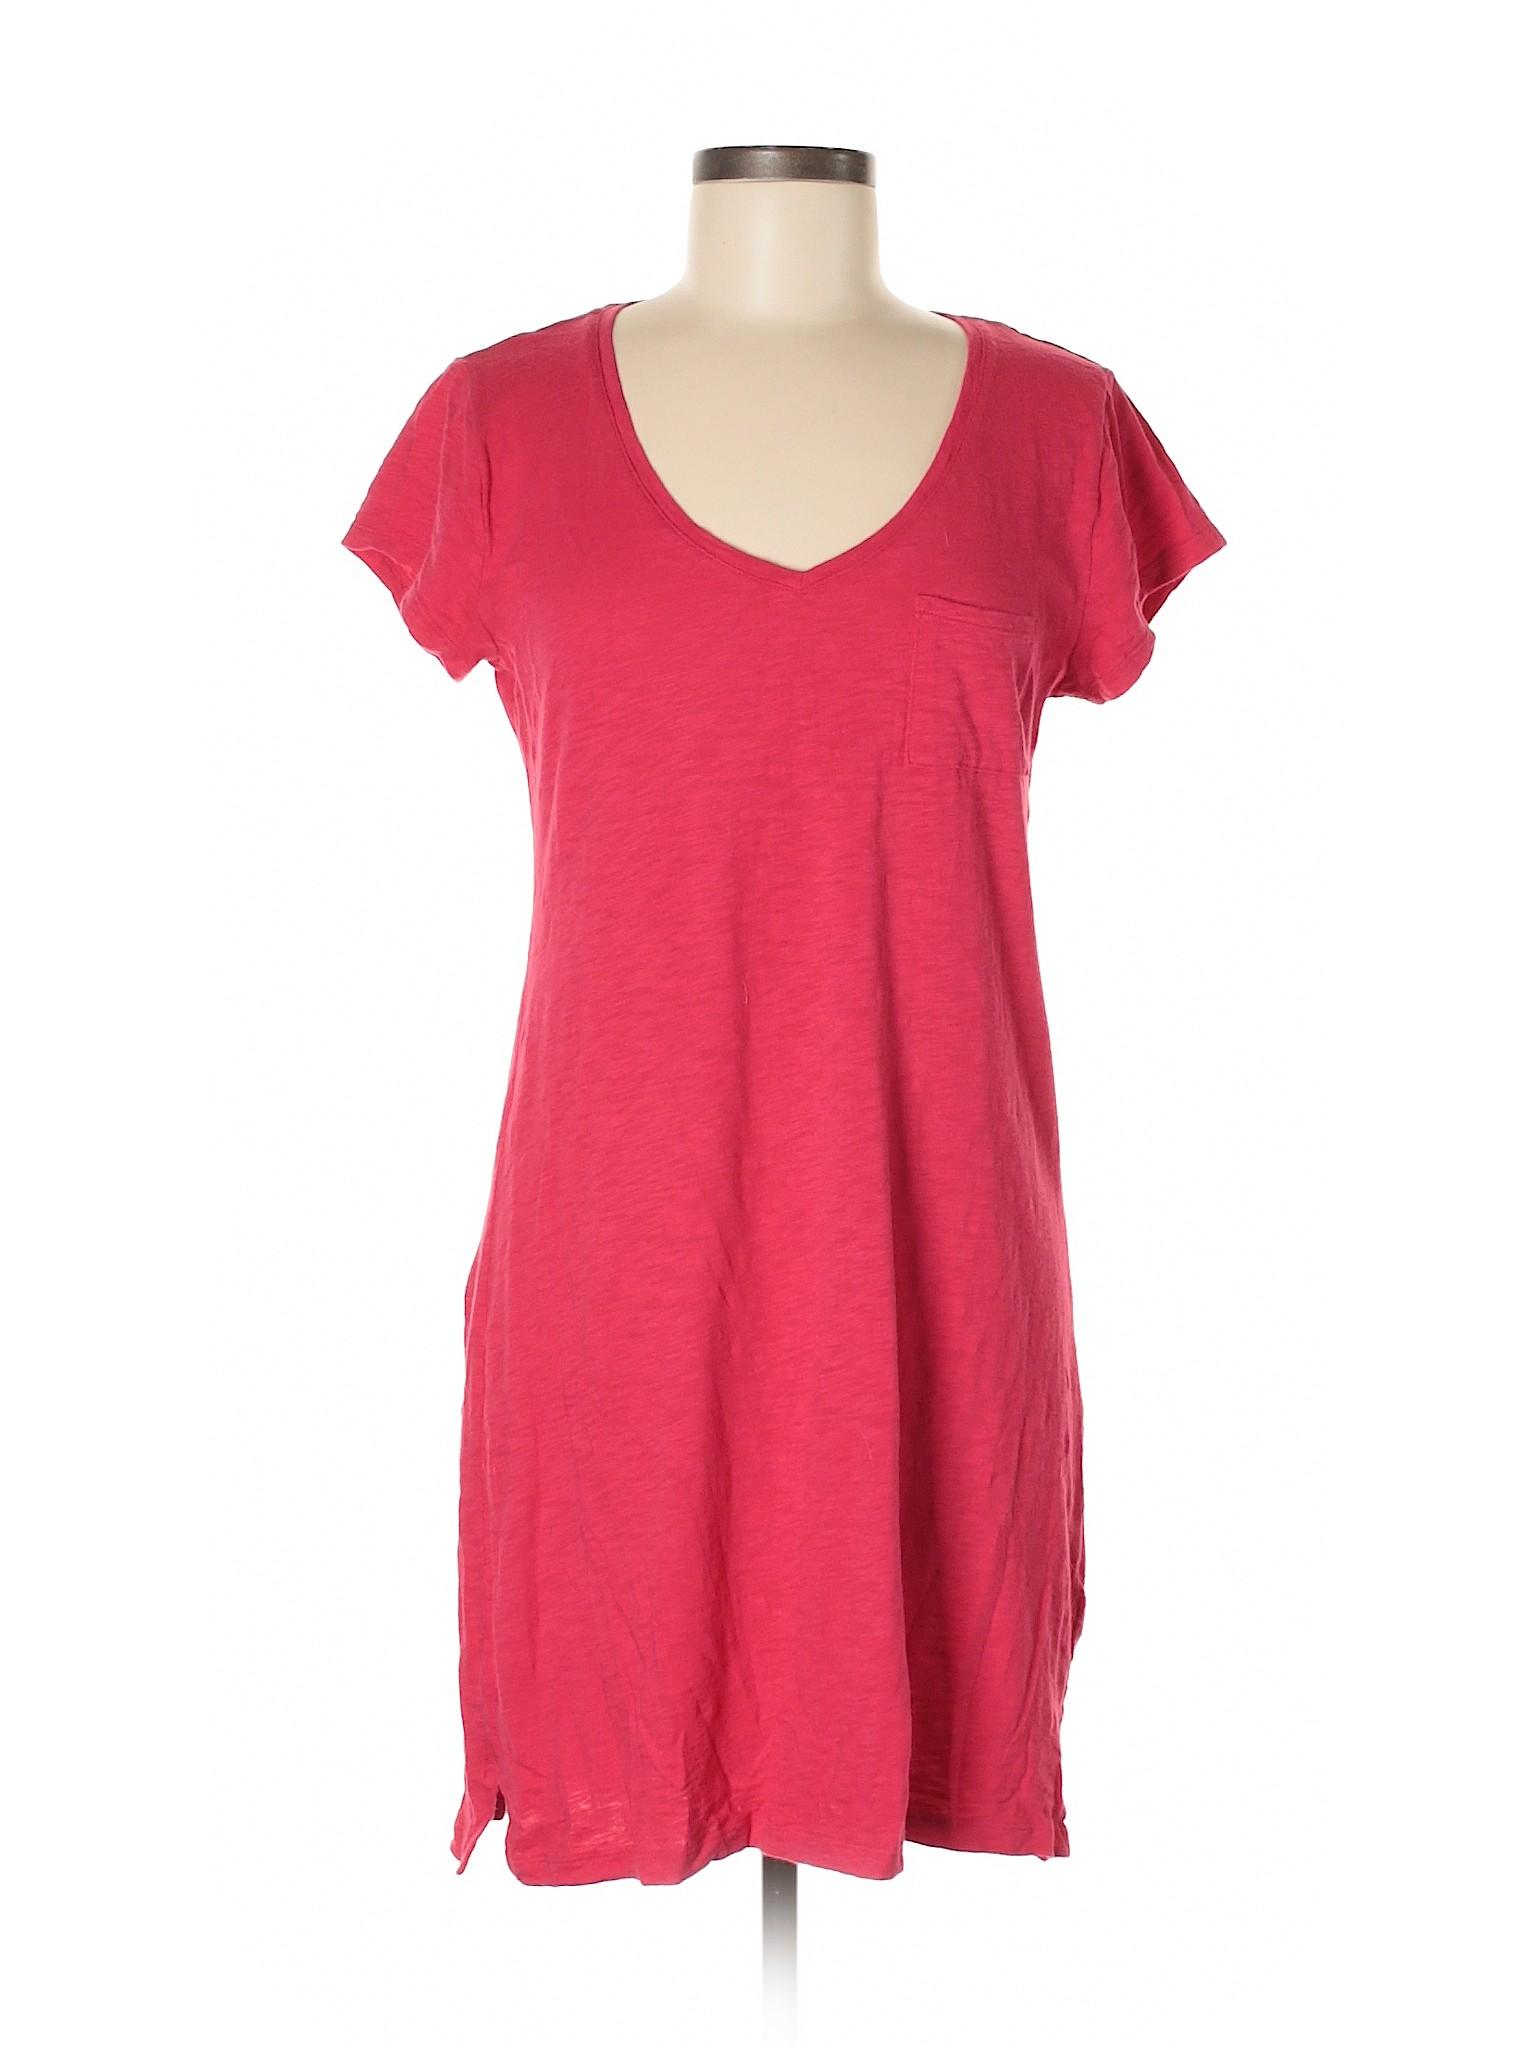 Outlet winter Casual Gap Dress Boutique Eqd0fq